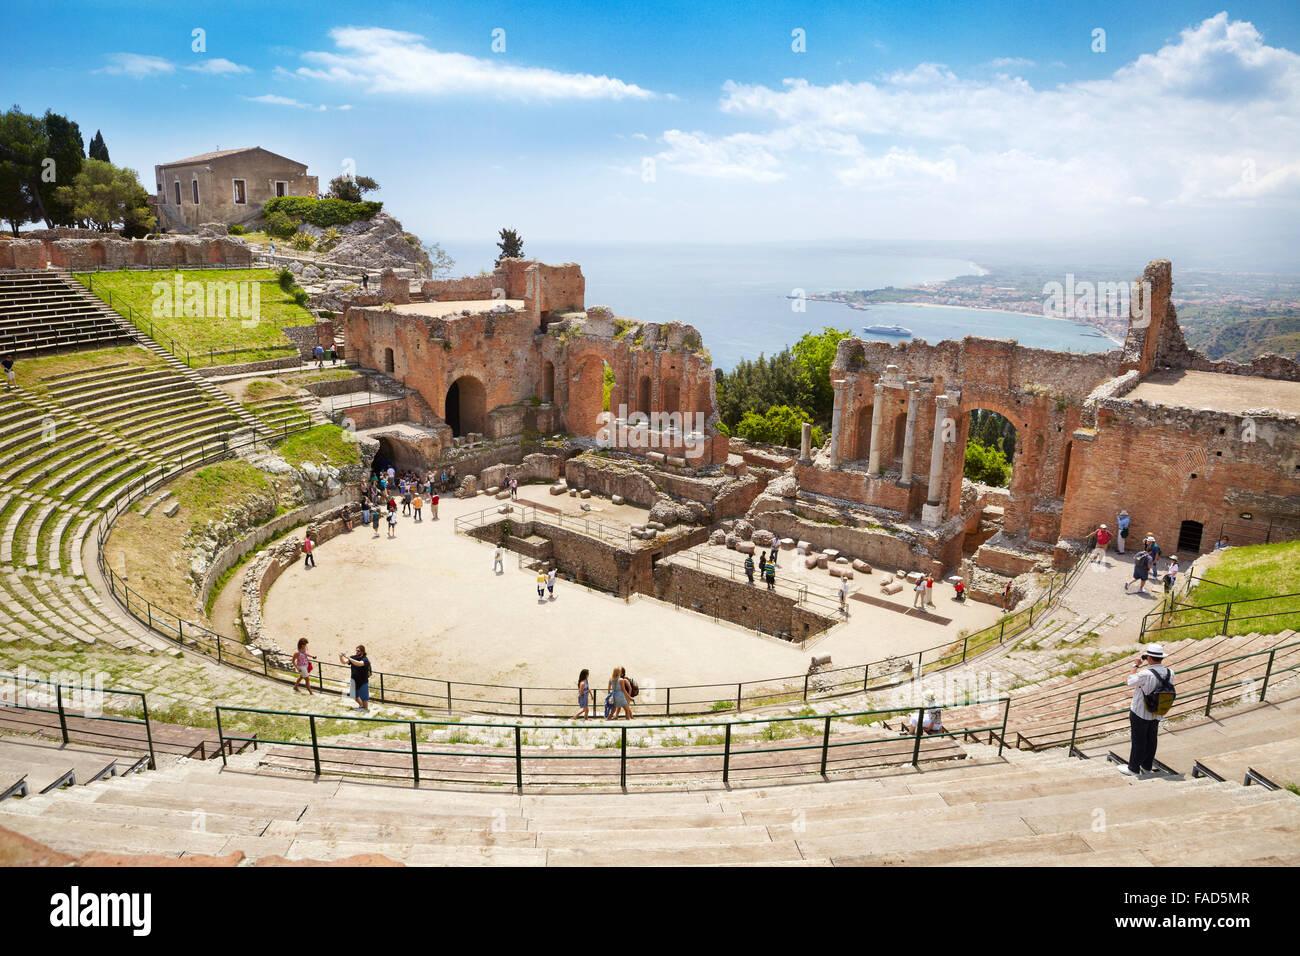 The Greek Theatre in Taormina, Sicily, Italy - Stock Image